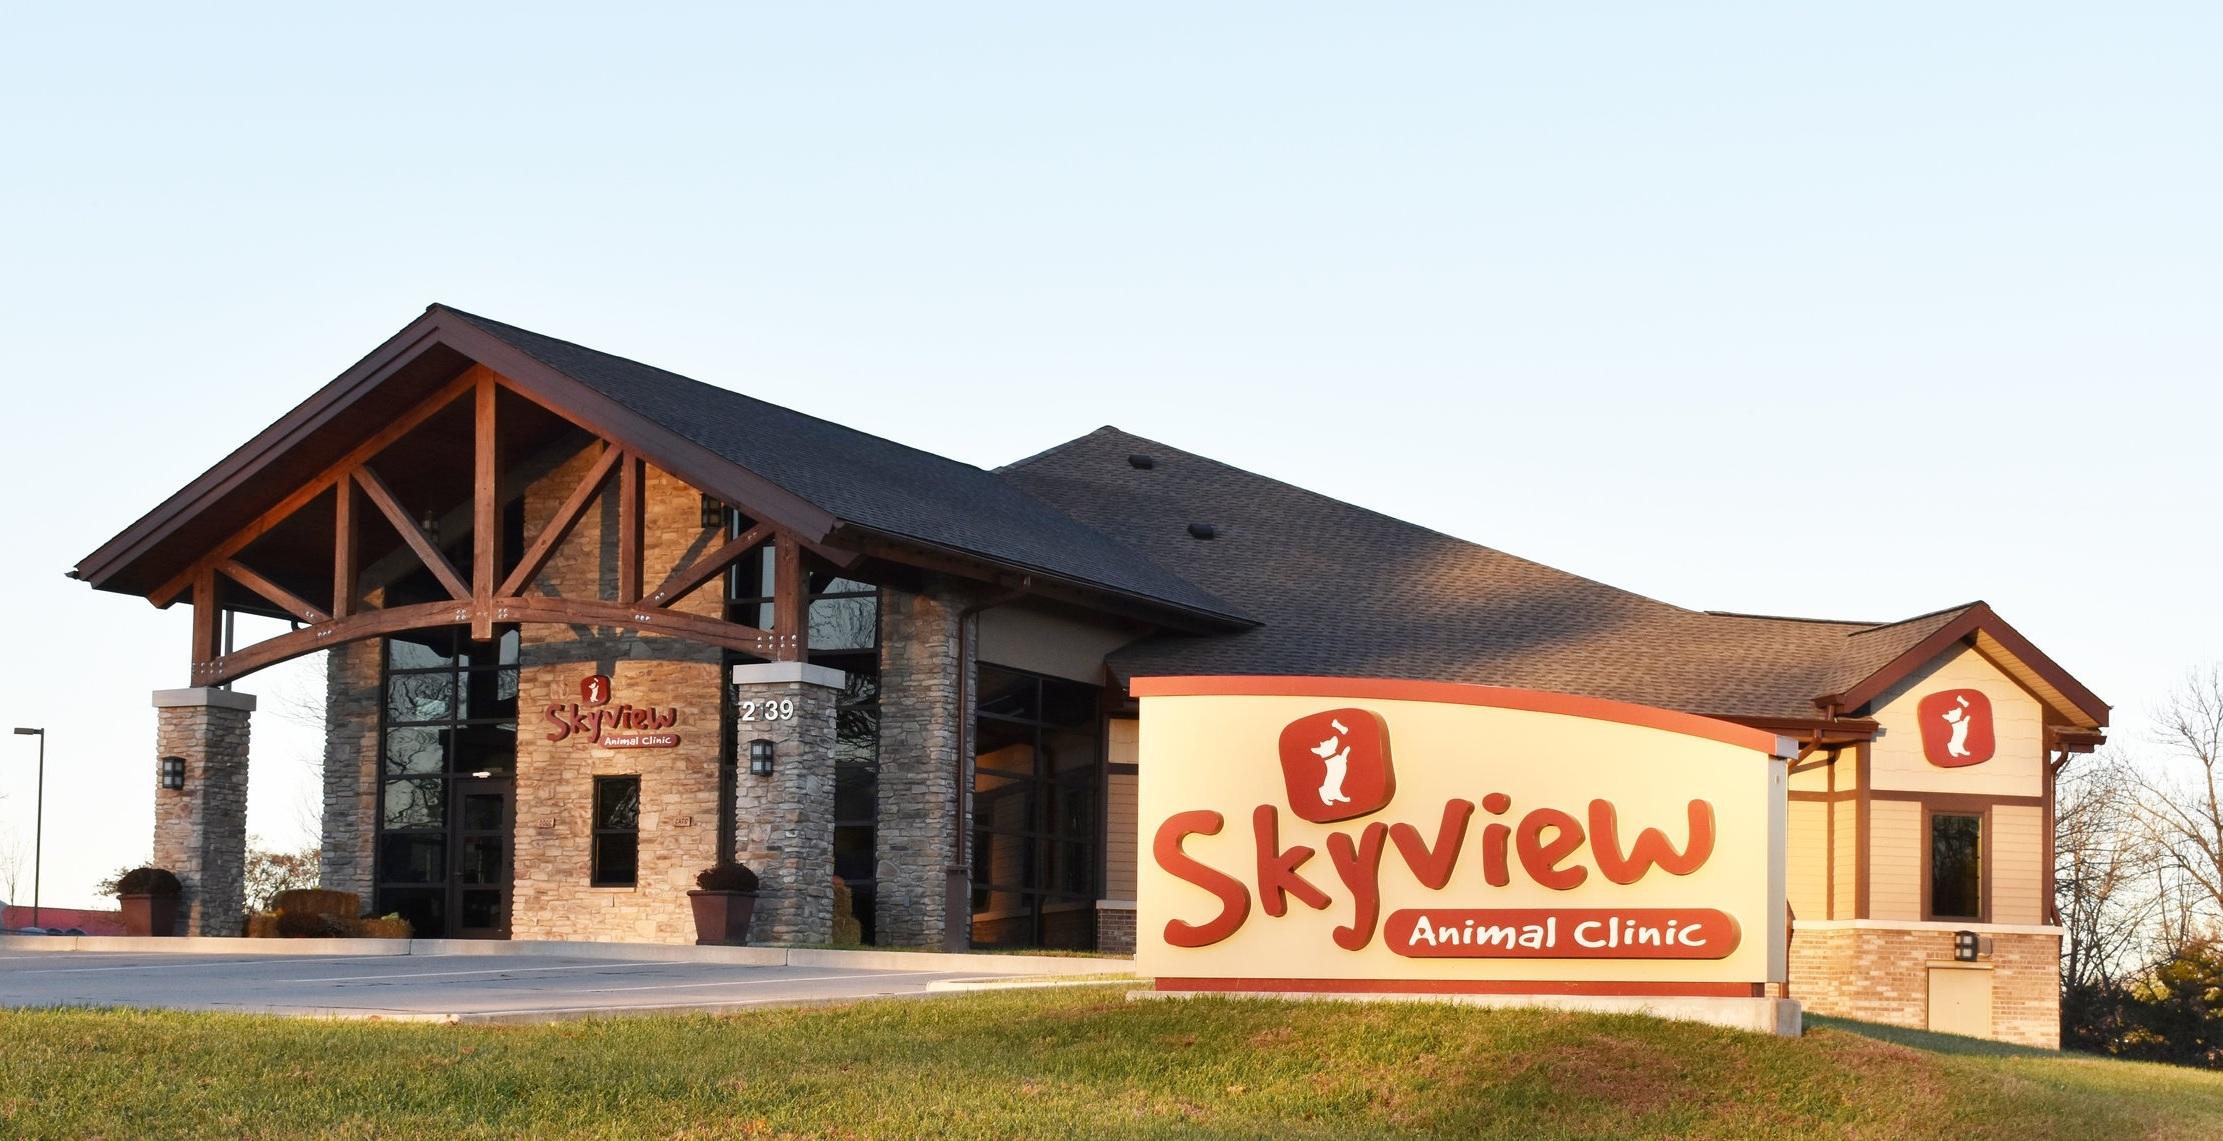 Skyview1.jpg